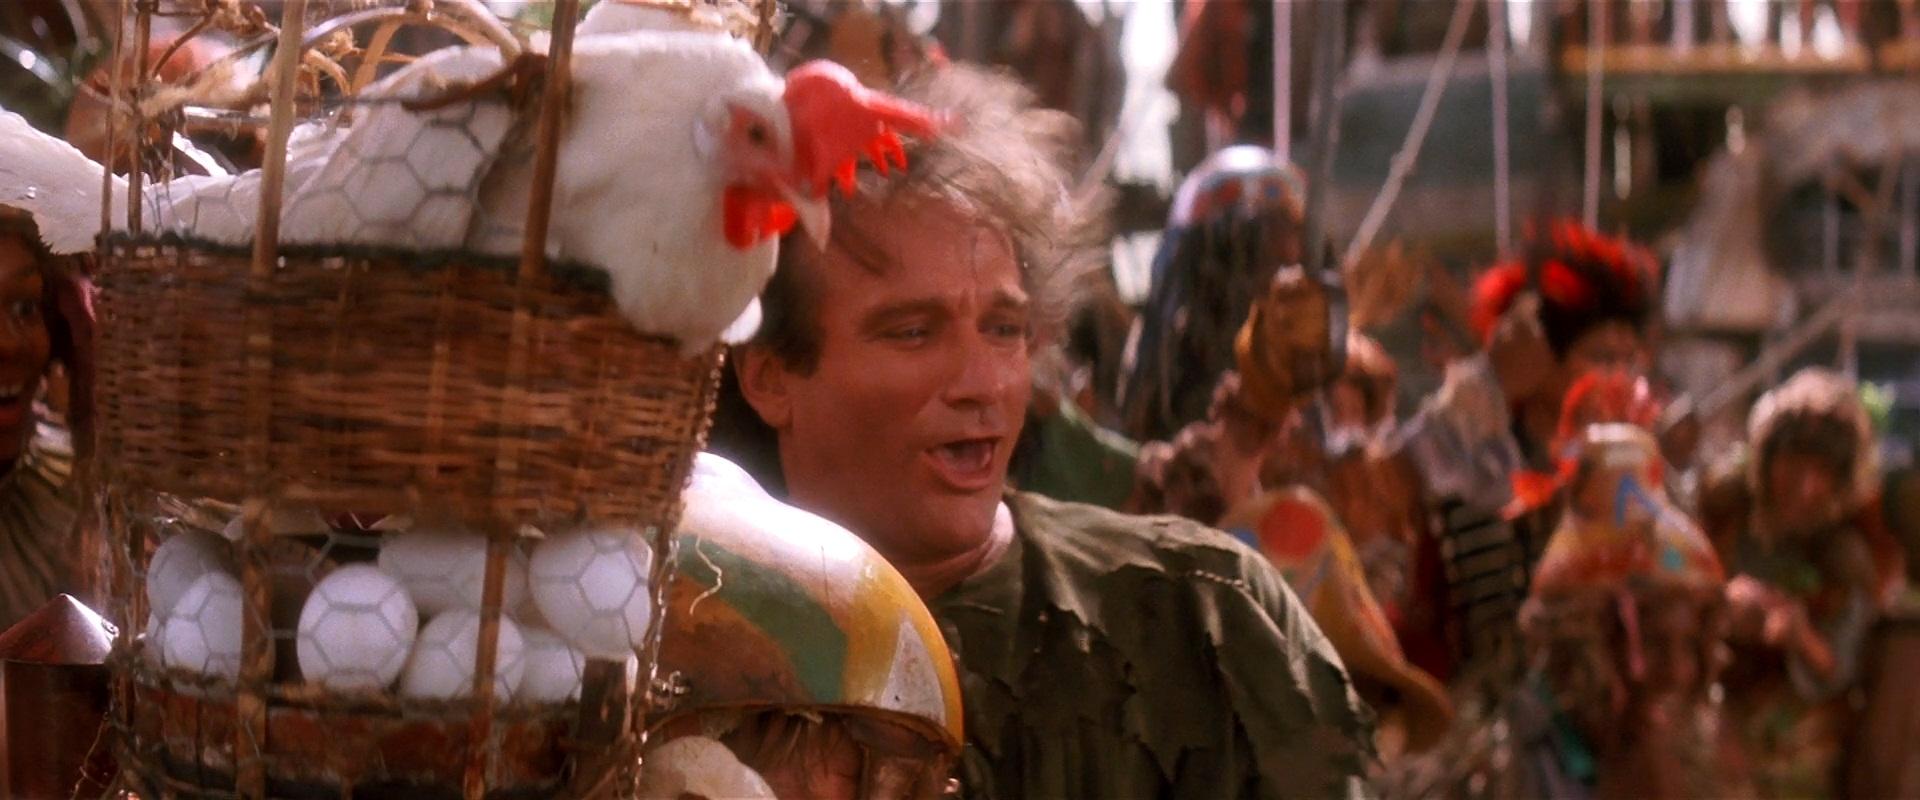 Robin Williams / Peter Pan